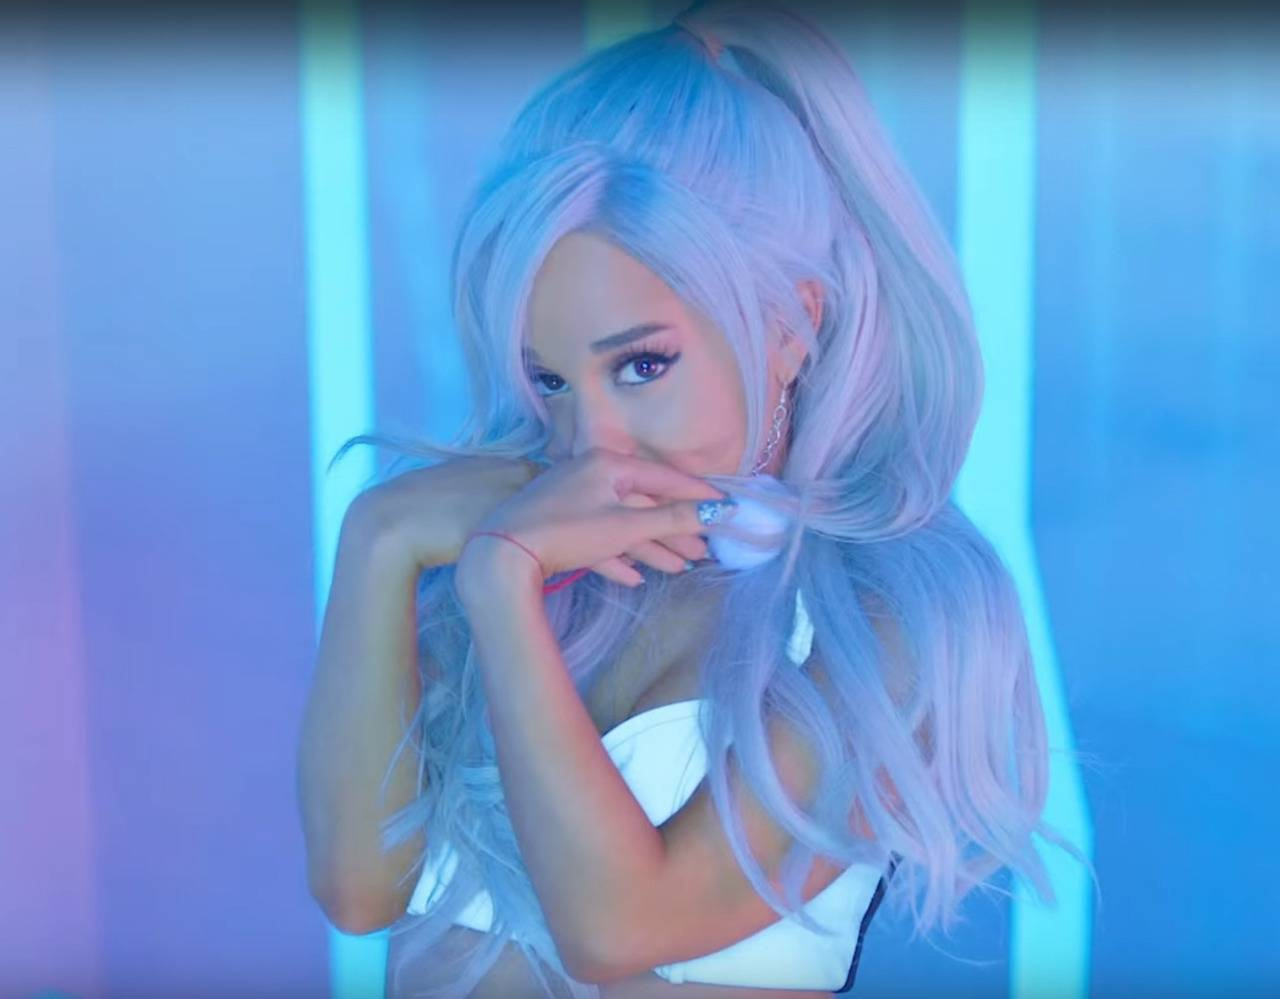 VIDEO: Ariana Grande je ve Focus vyumělkovanou panenkou